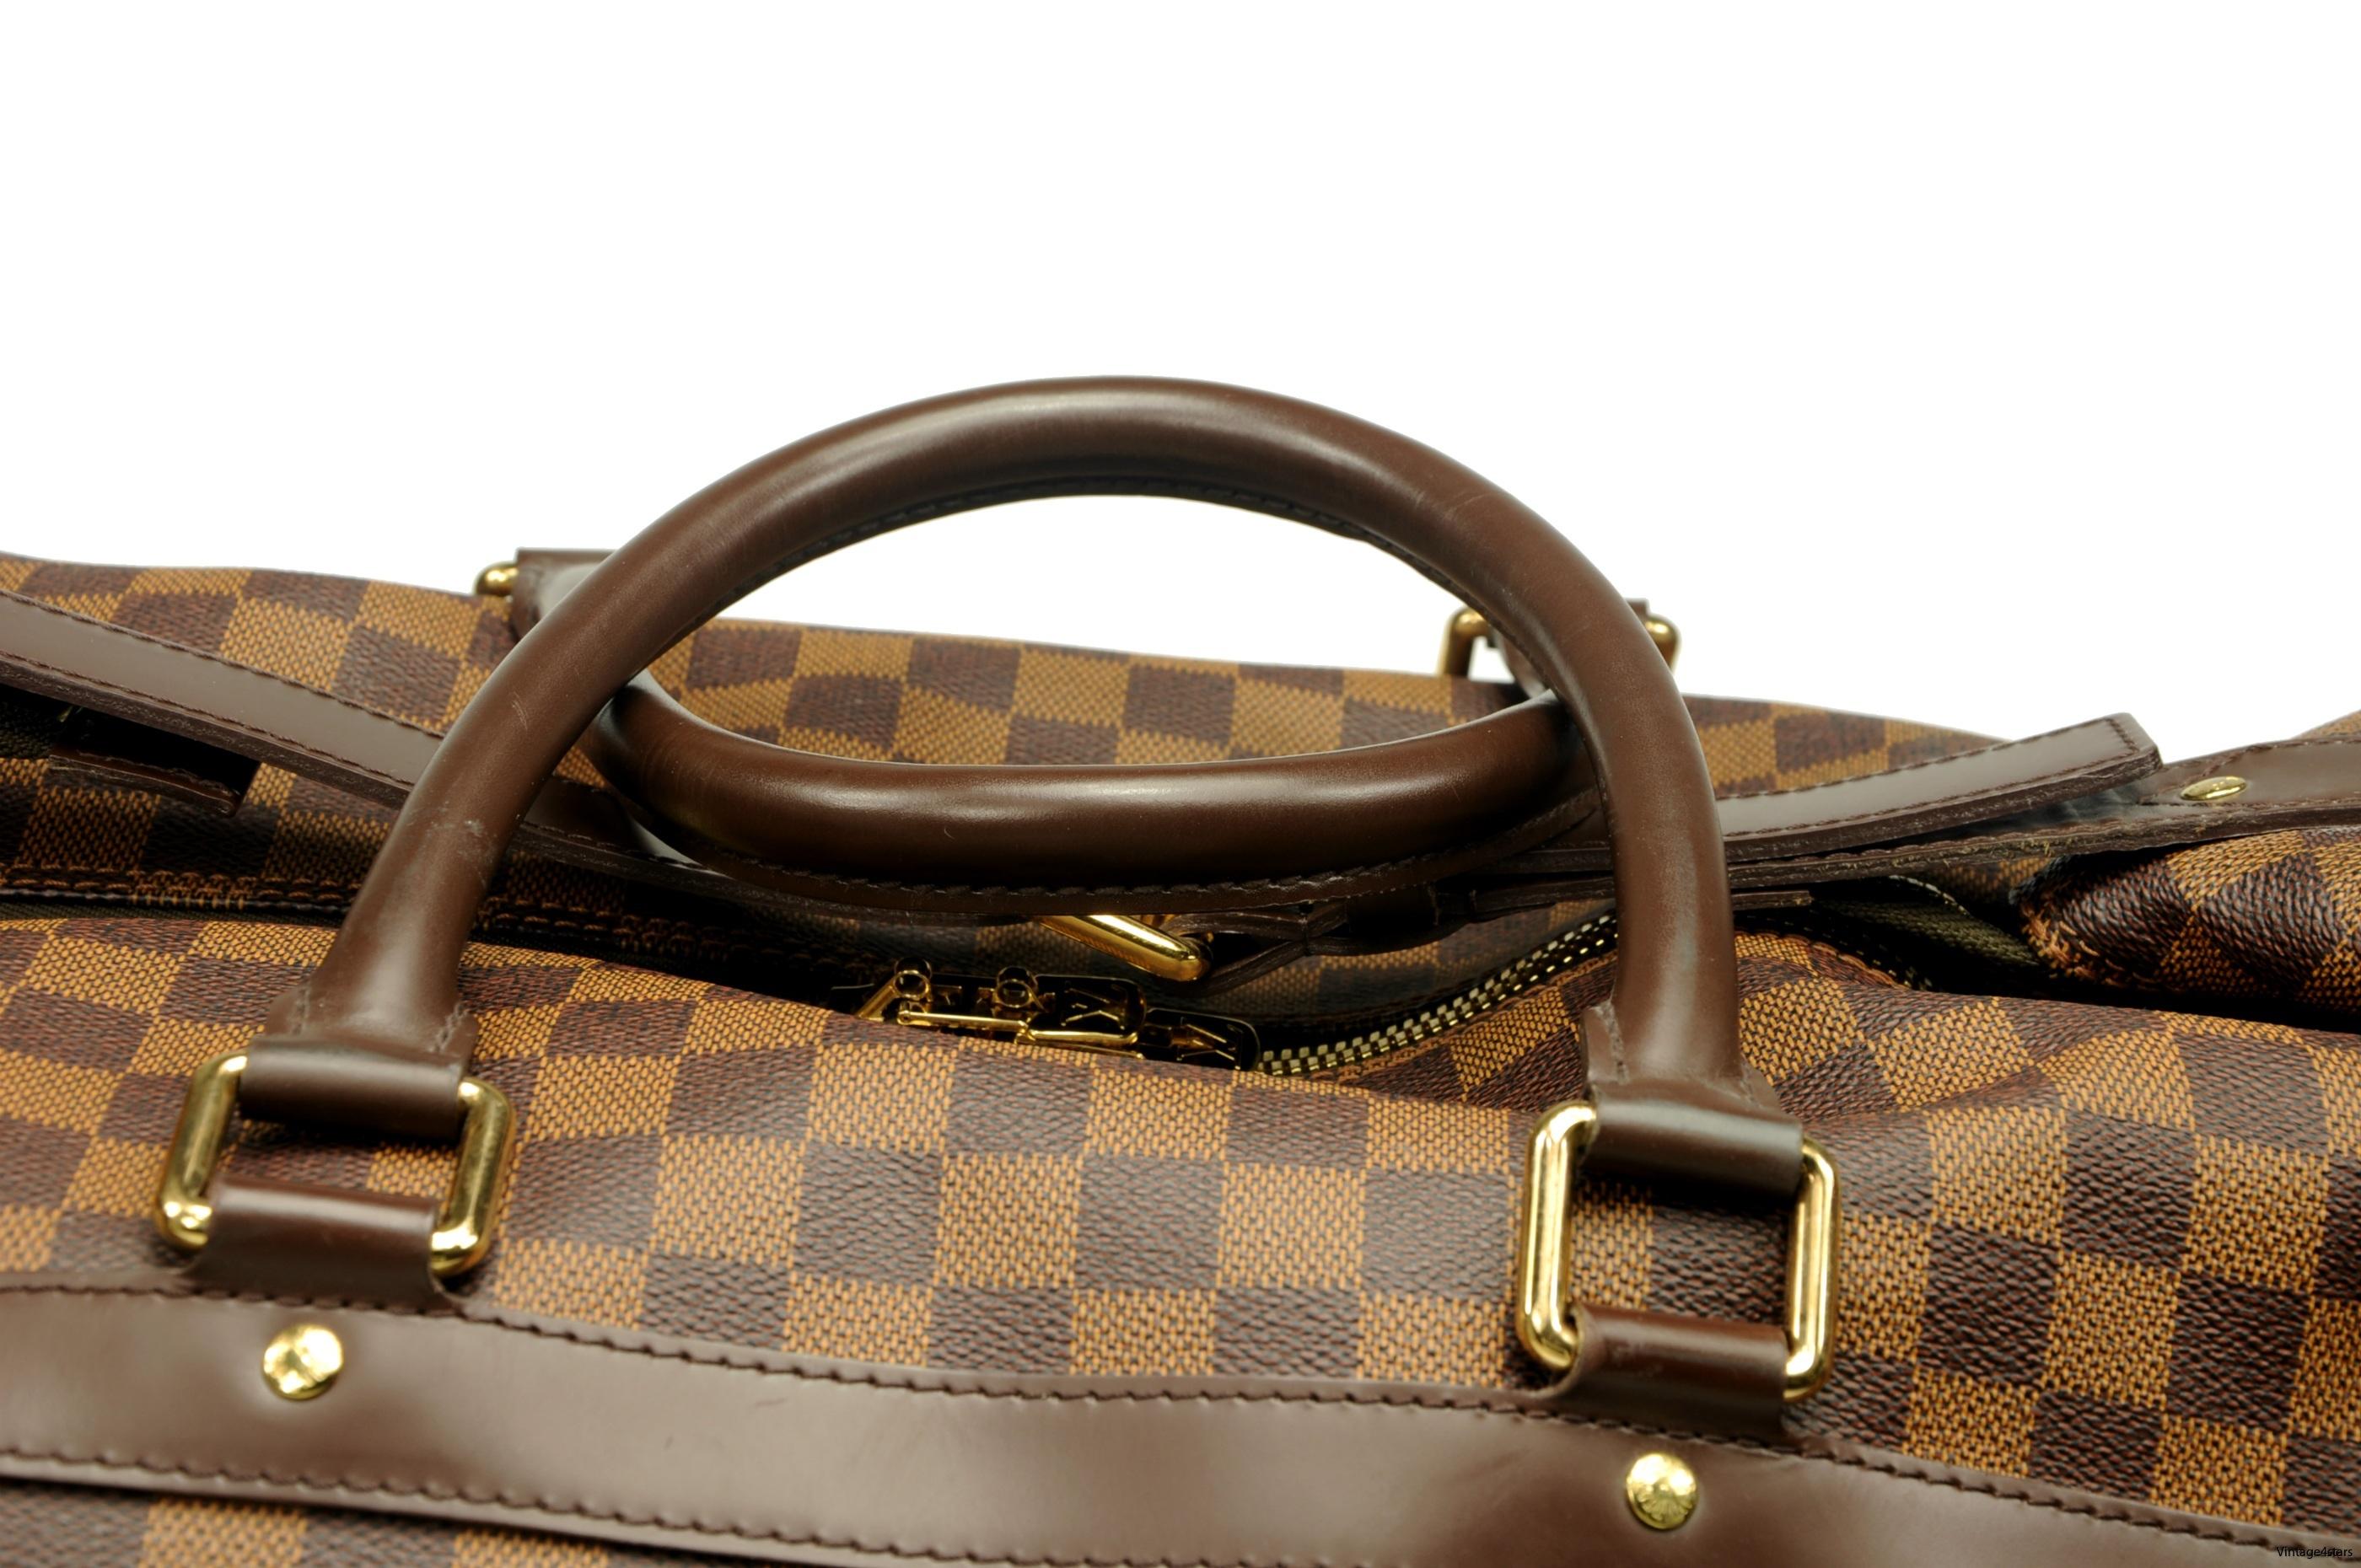 Louis Vuitton Eole 60 Damier Ebene 6